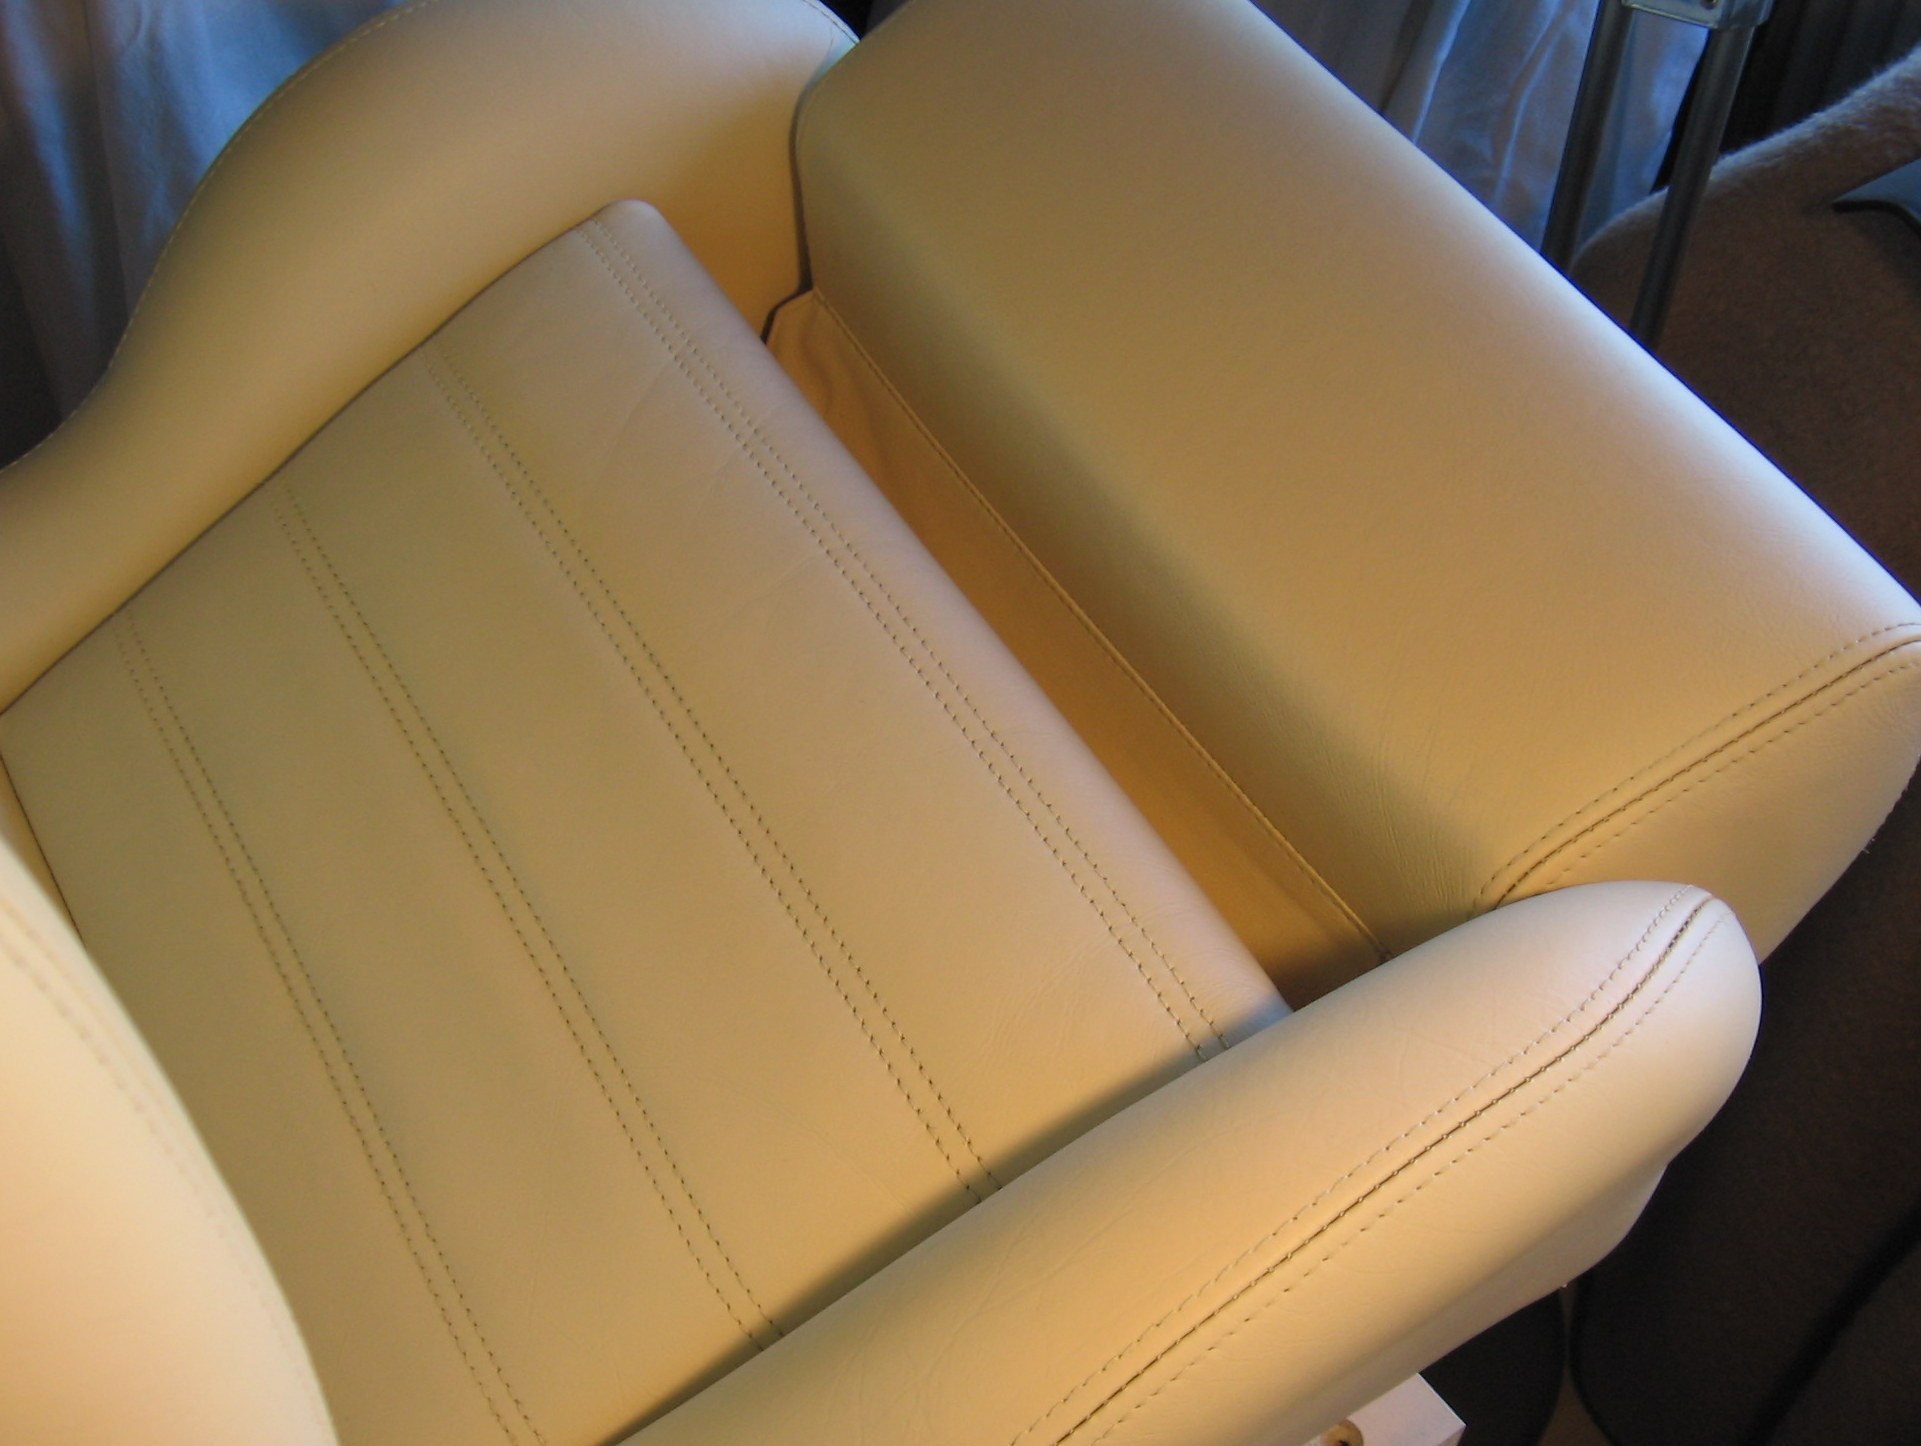 autoleder pflegen top premium profi pflege set natur echt autoleder schicht schwamm with. Black Bedroom Furniture Sets. Home Design Ideas